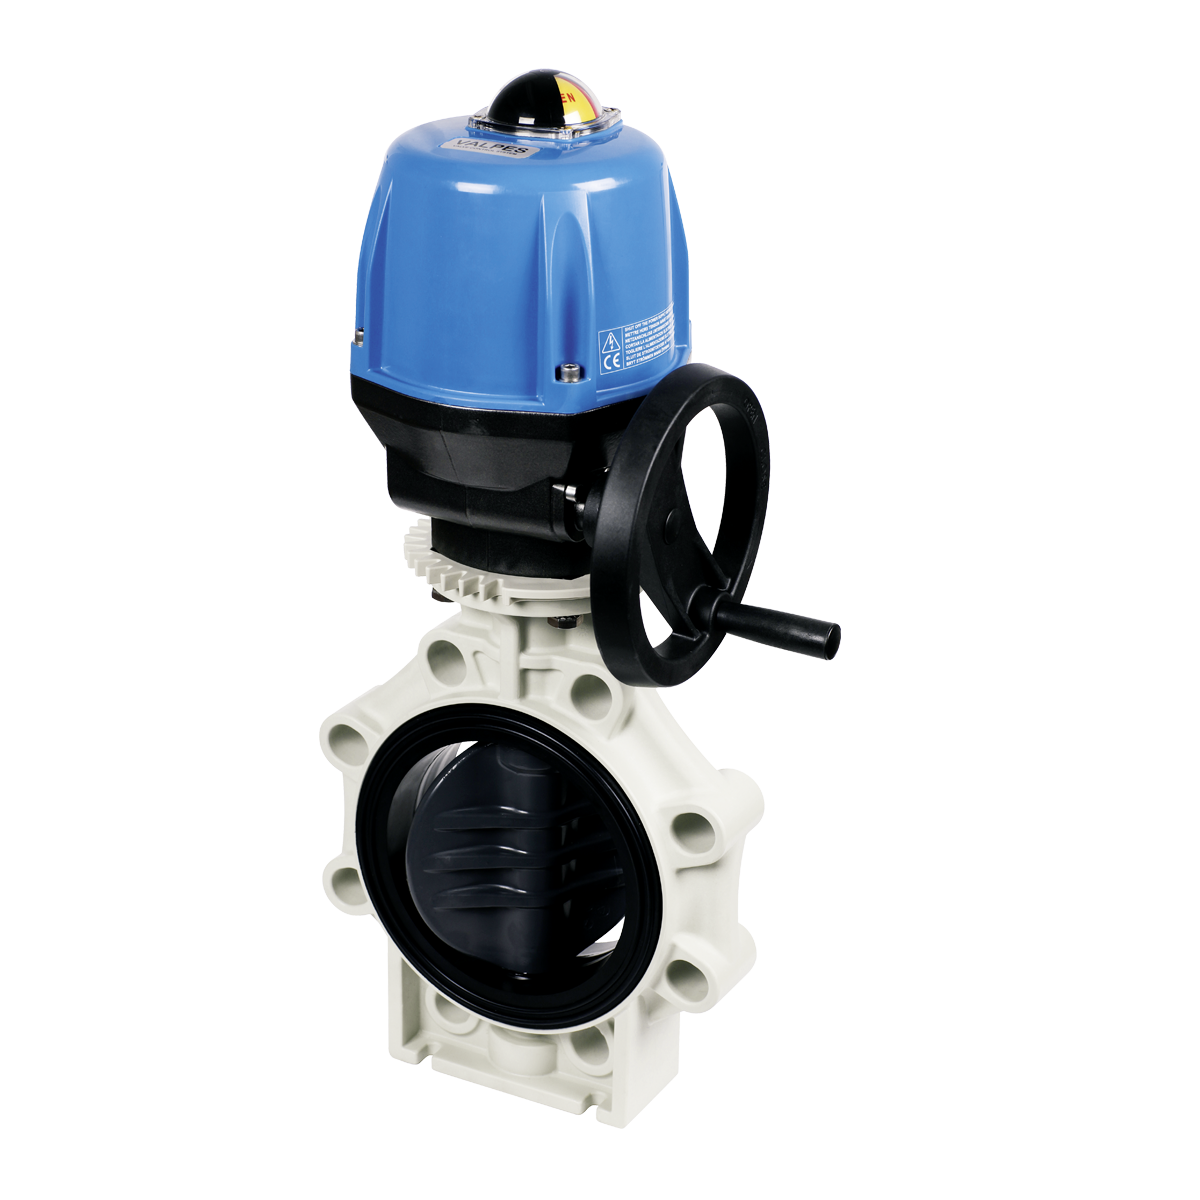 Praher butterfly valve K4 PVC with Valpes actuator, grey, black, beige, blue